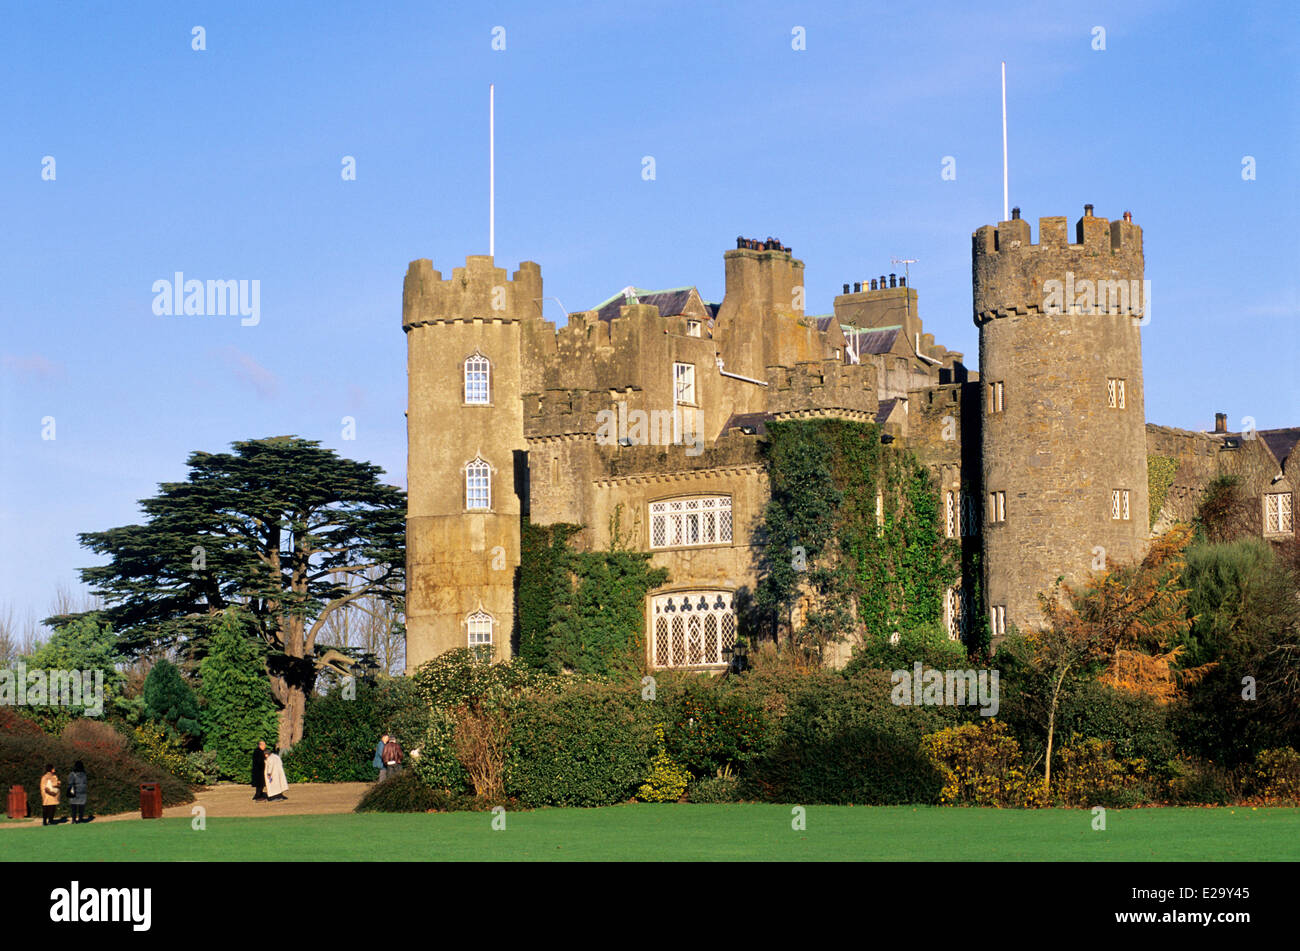 Ireland, County Dublin, Malahide castle - Stock Image